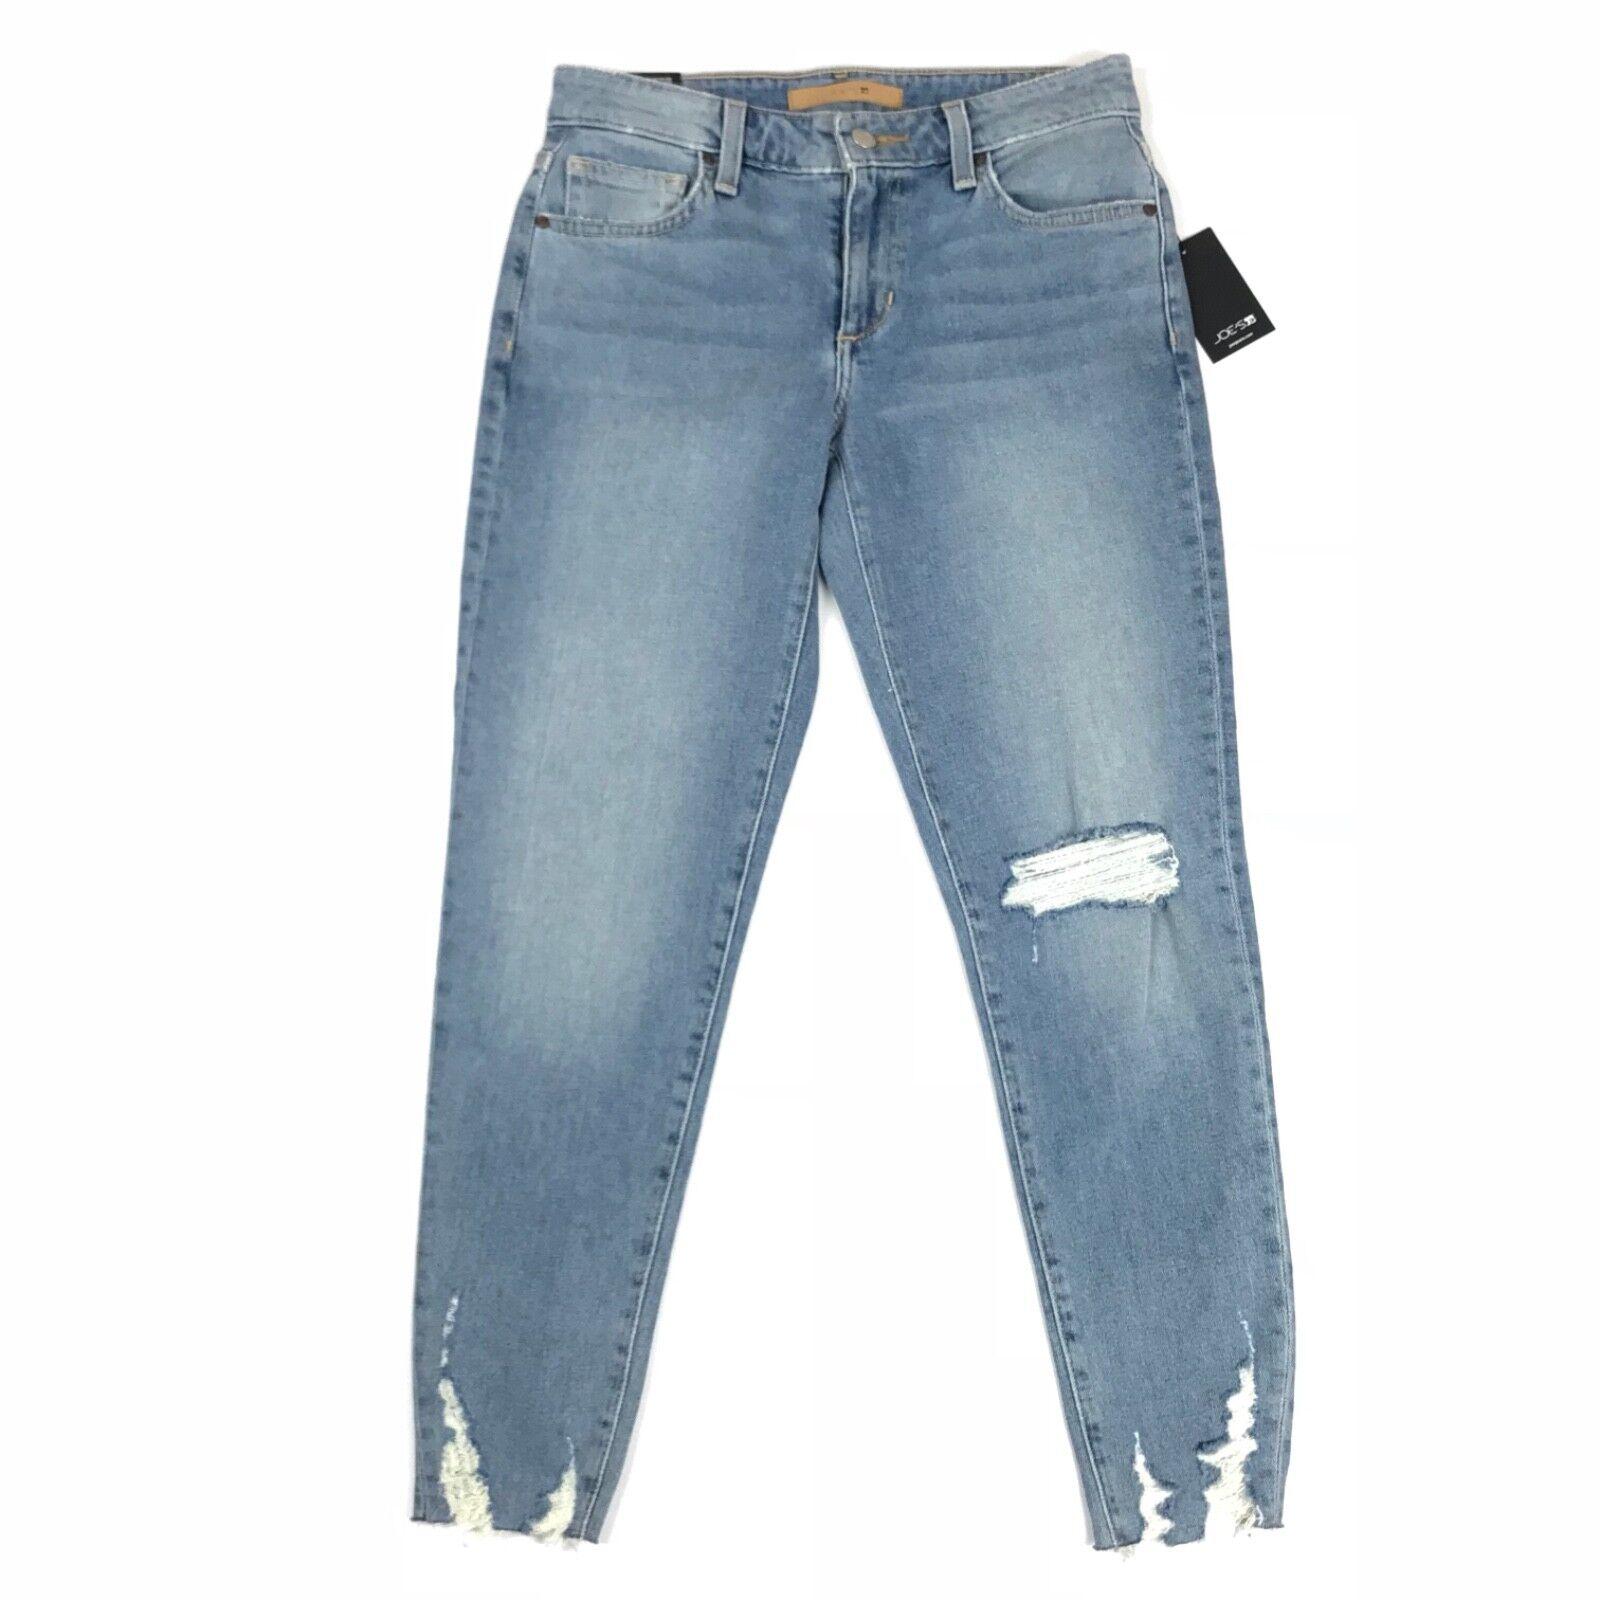 Joes Jeans Womens Jeans Boyfriend Slim Crop Distressed Raw Hem Size 24X26